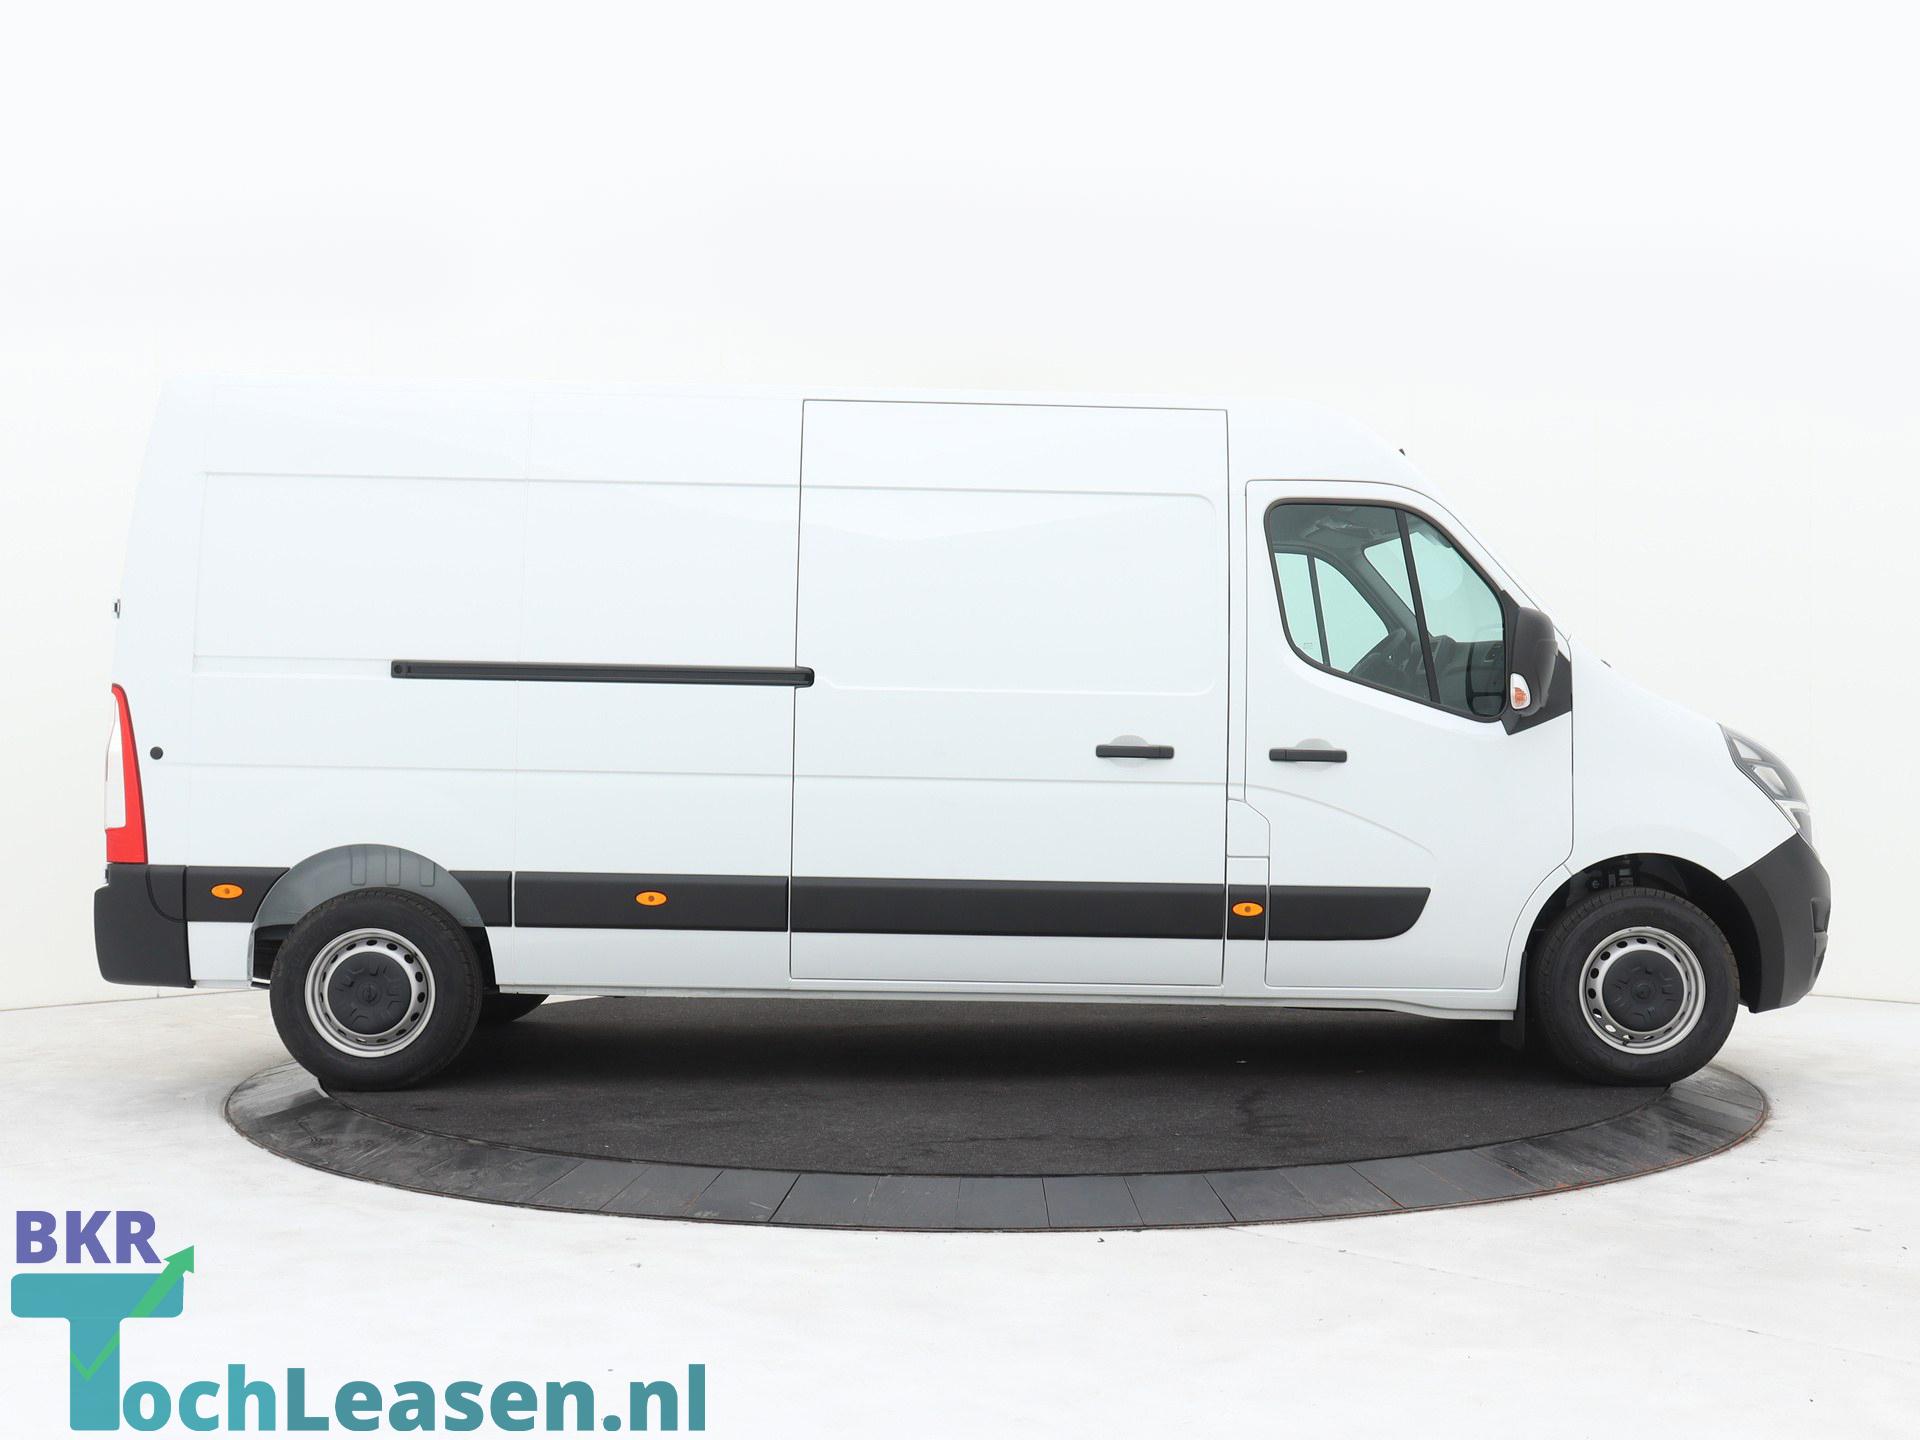 BKRTochLeasen.nl - Opel Movano - L3H2 - wit 11